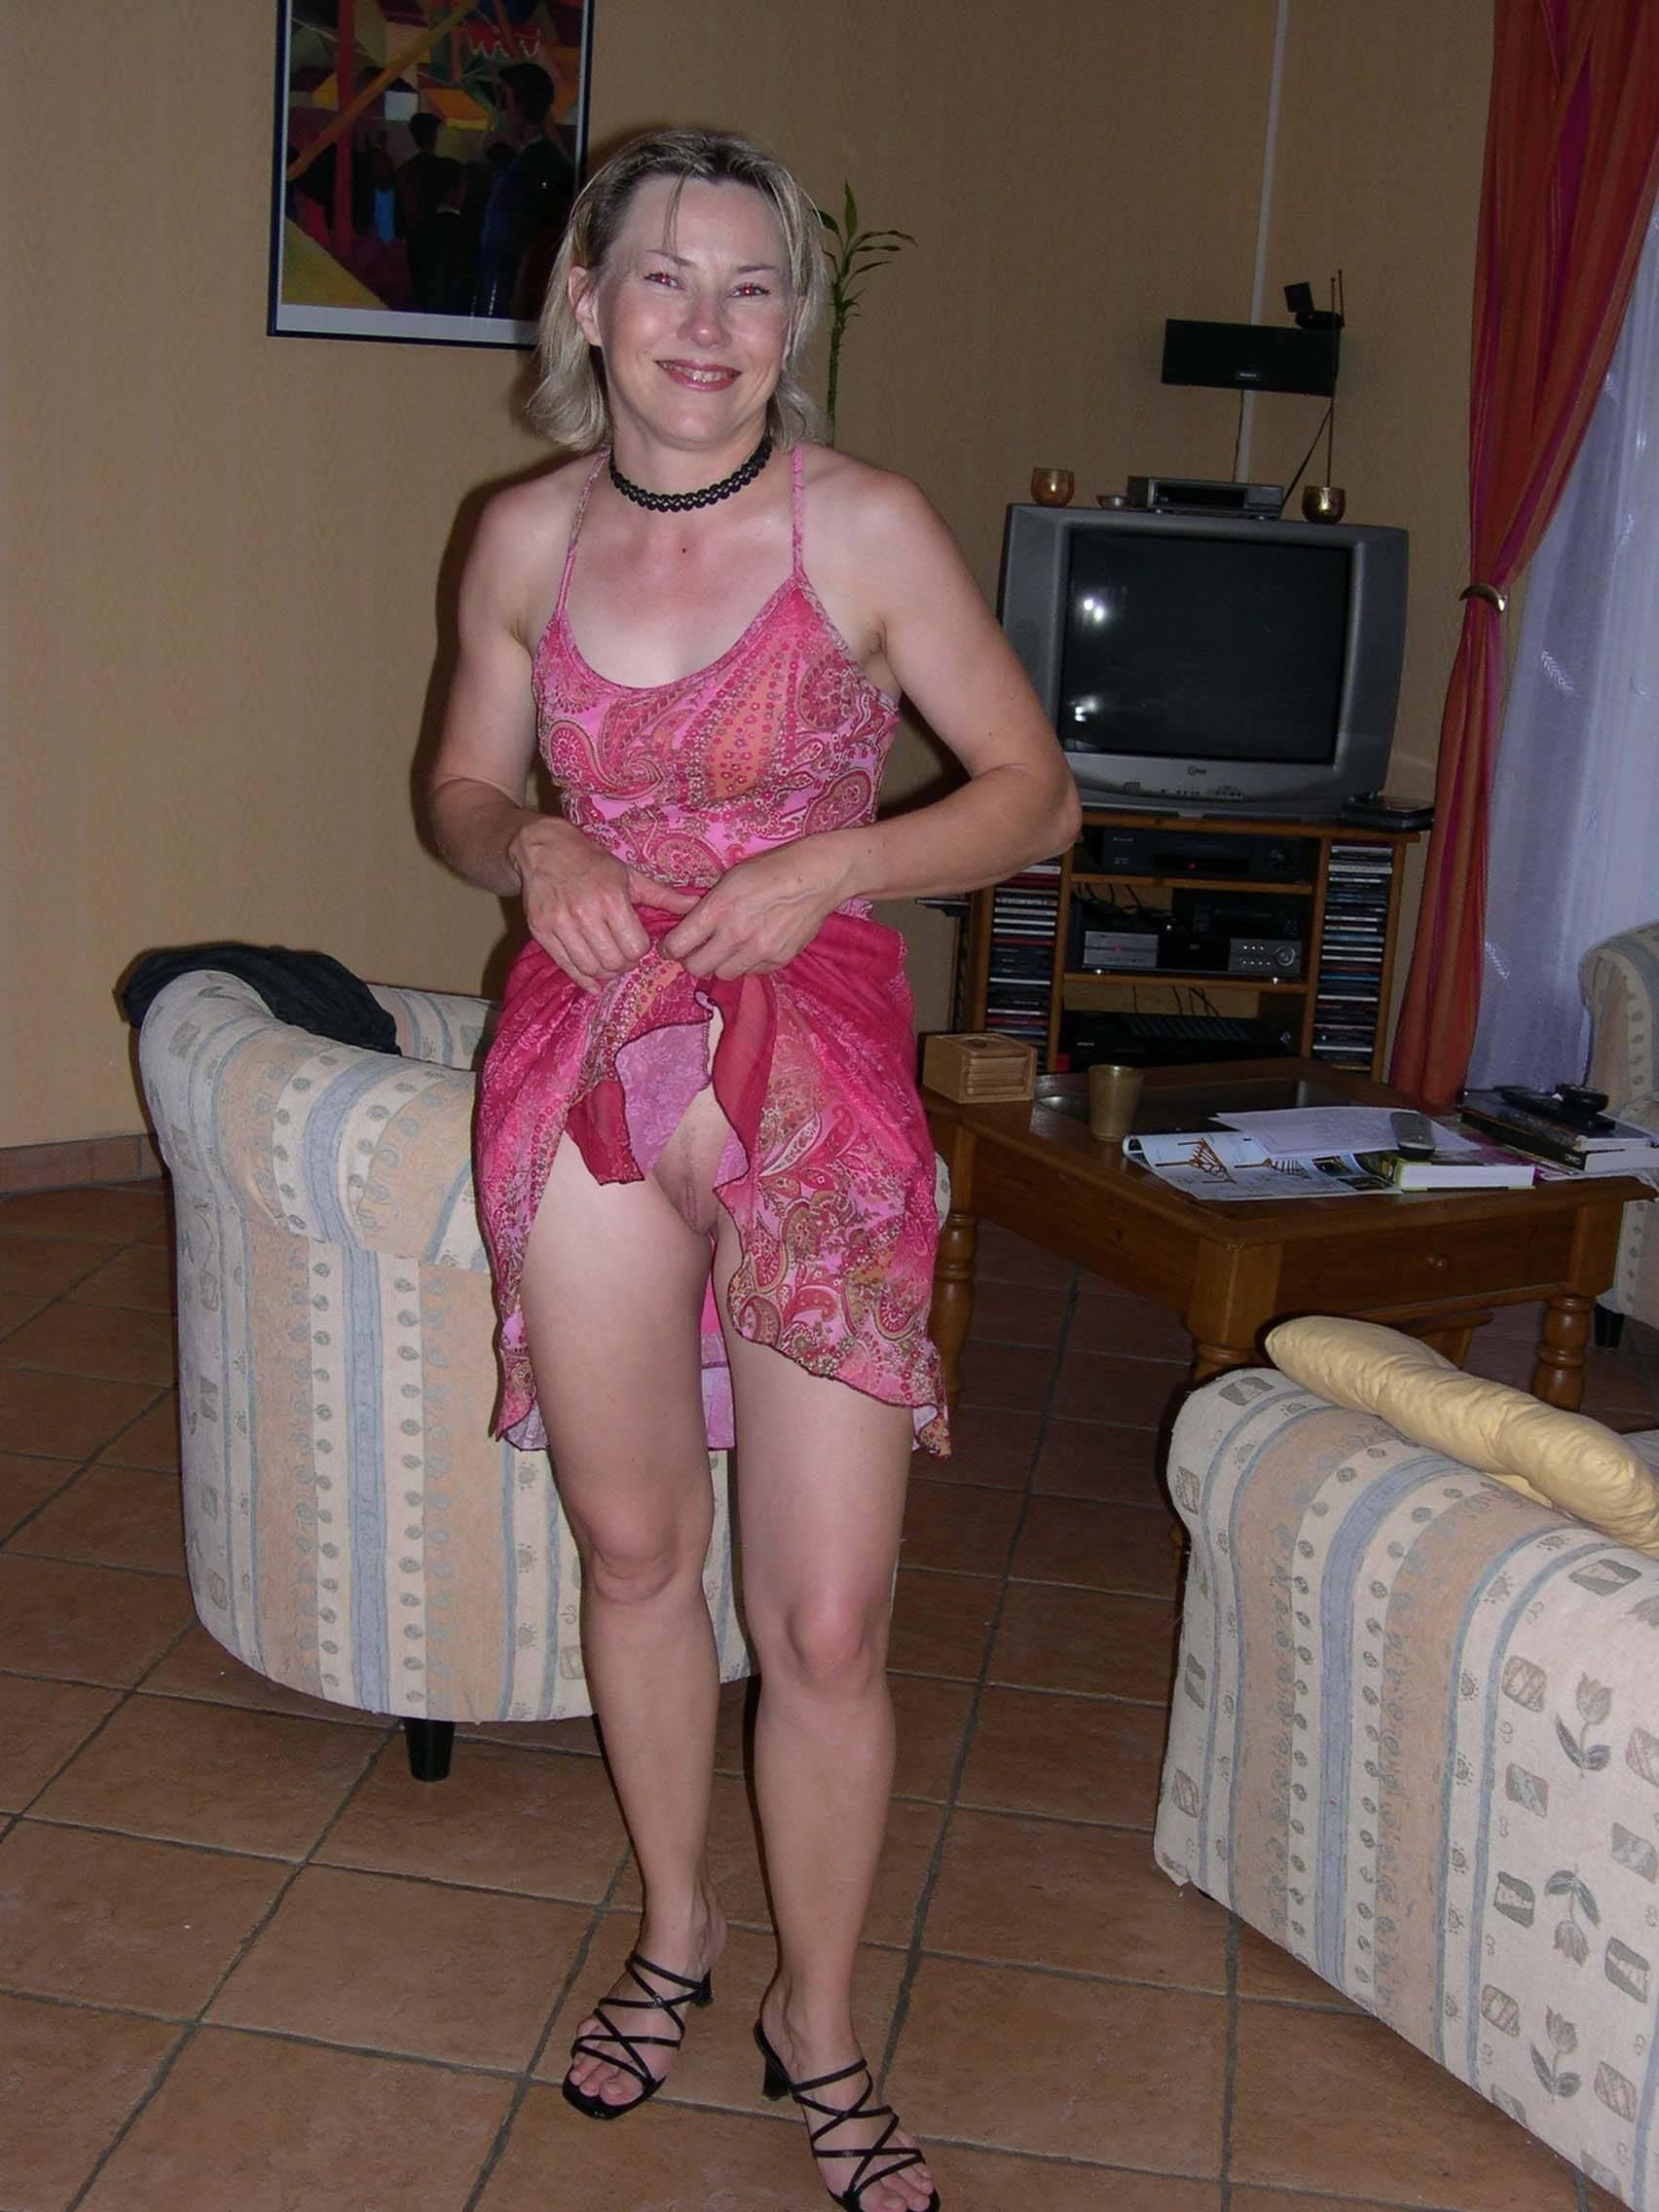 Эро фото под юбкой - компиляция 18